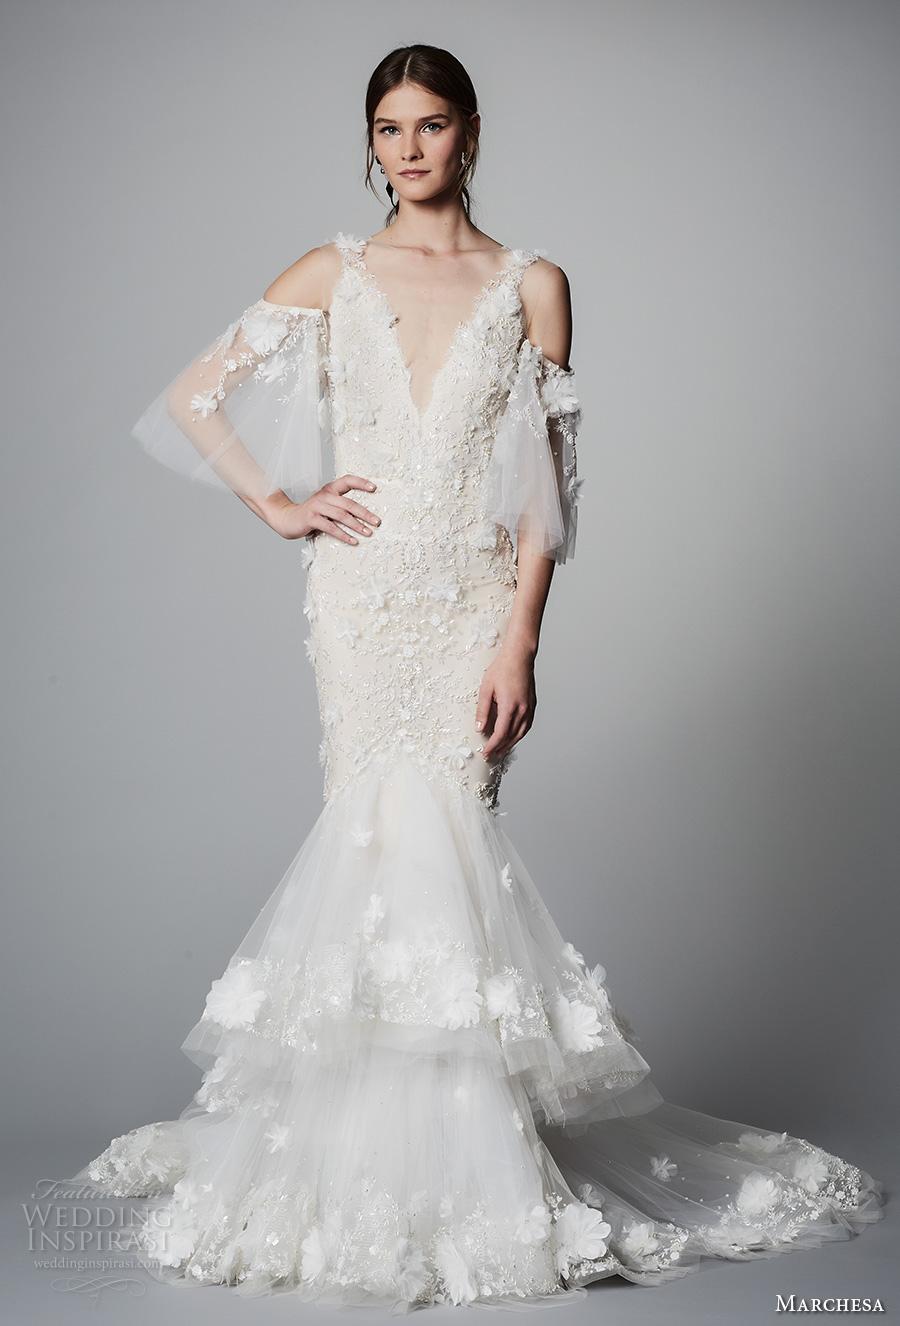 Marchesa Bridal Spring 2018 Wedding Dresses  New York